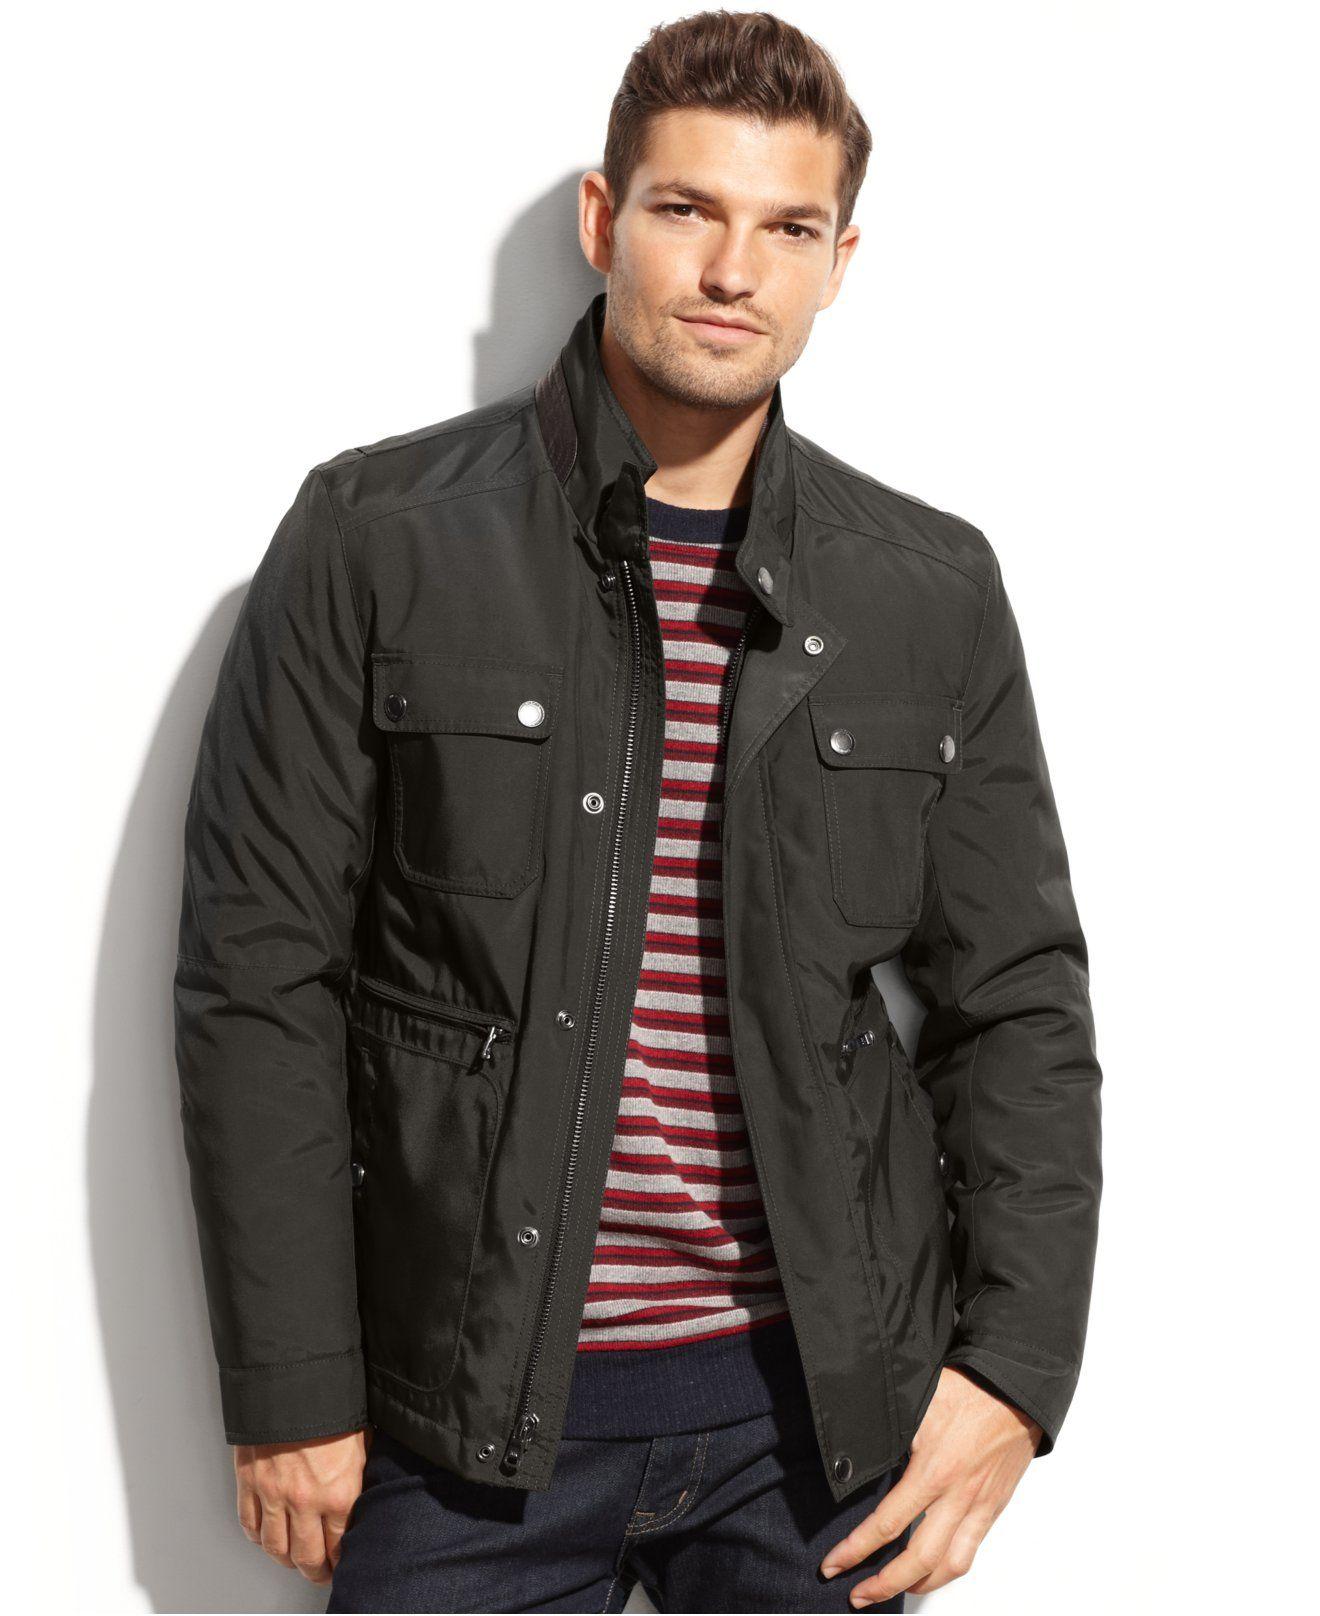 Michael Michael Kors Fruita Cropped Leather Trim Field Coat Coats Jackets Men Macy S Http Www1 Macys Com Shop Field Coat Mens Jackets Coats Jackets [ 1616 x 1320 Pixel ]